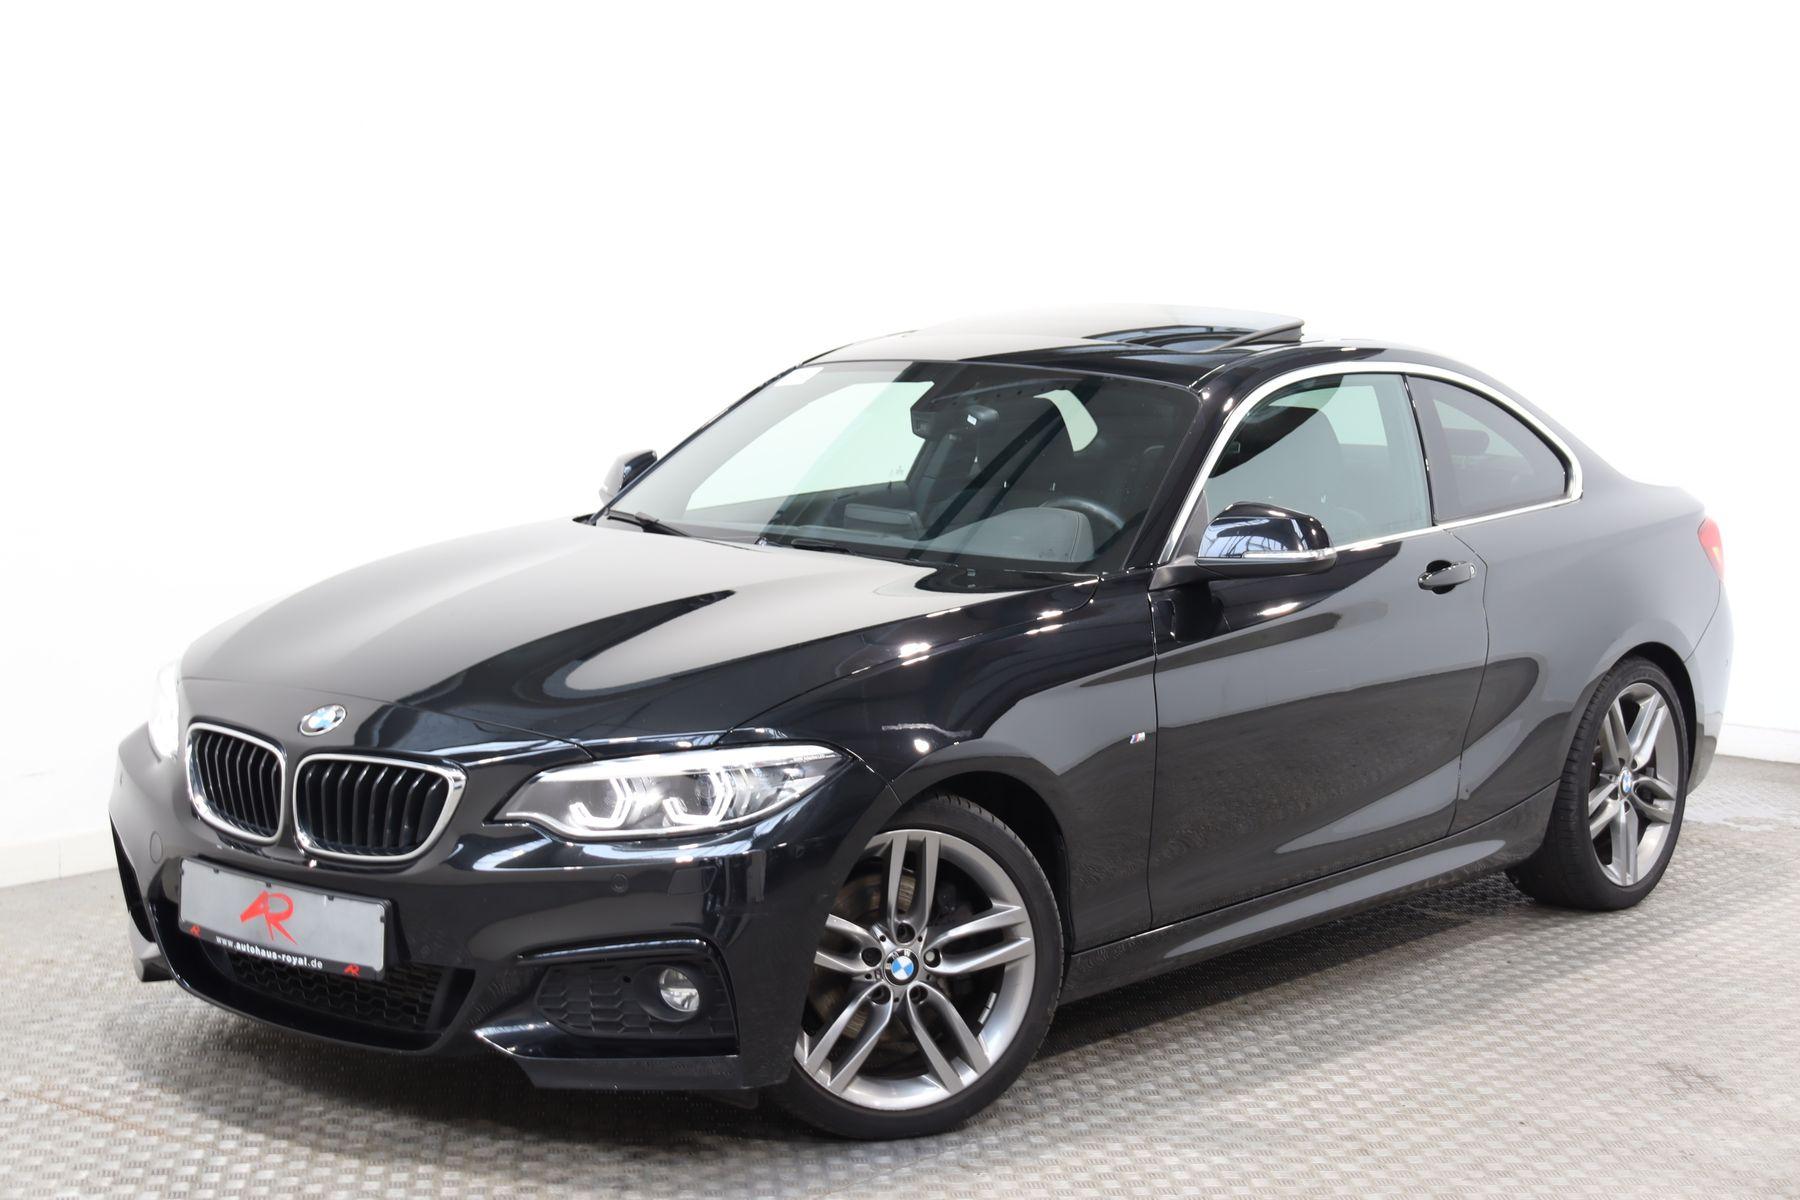 BMW 225 d Coupe M SPORT LED,NAVI,KEYLESS,GLASDACH, Jahr 2017, Diesel